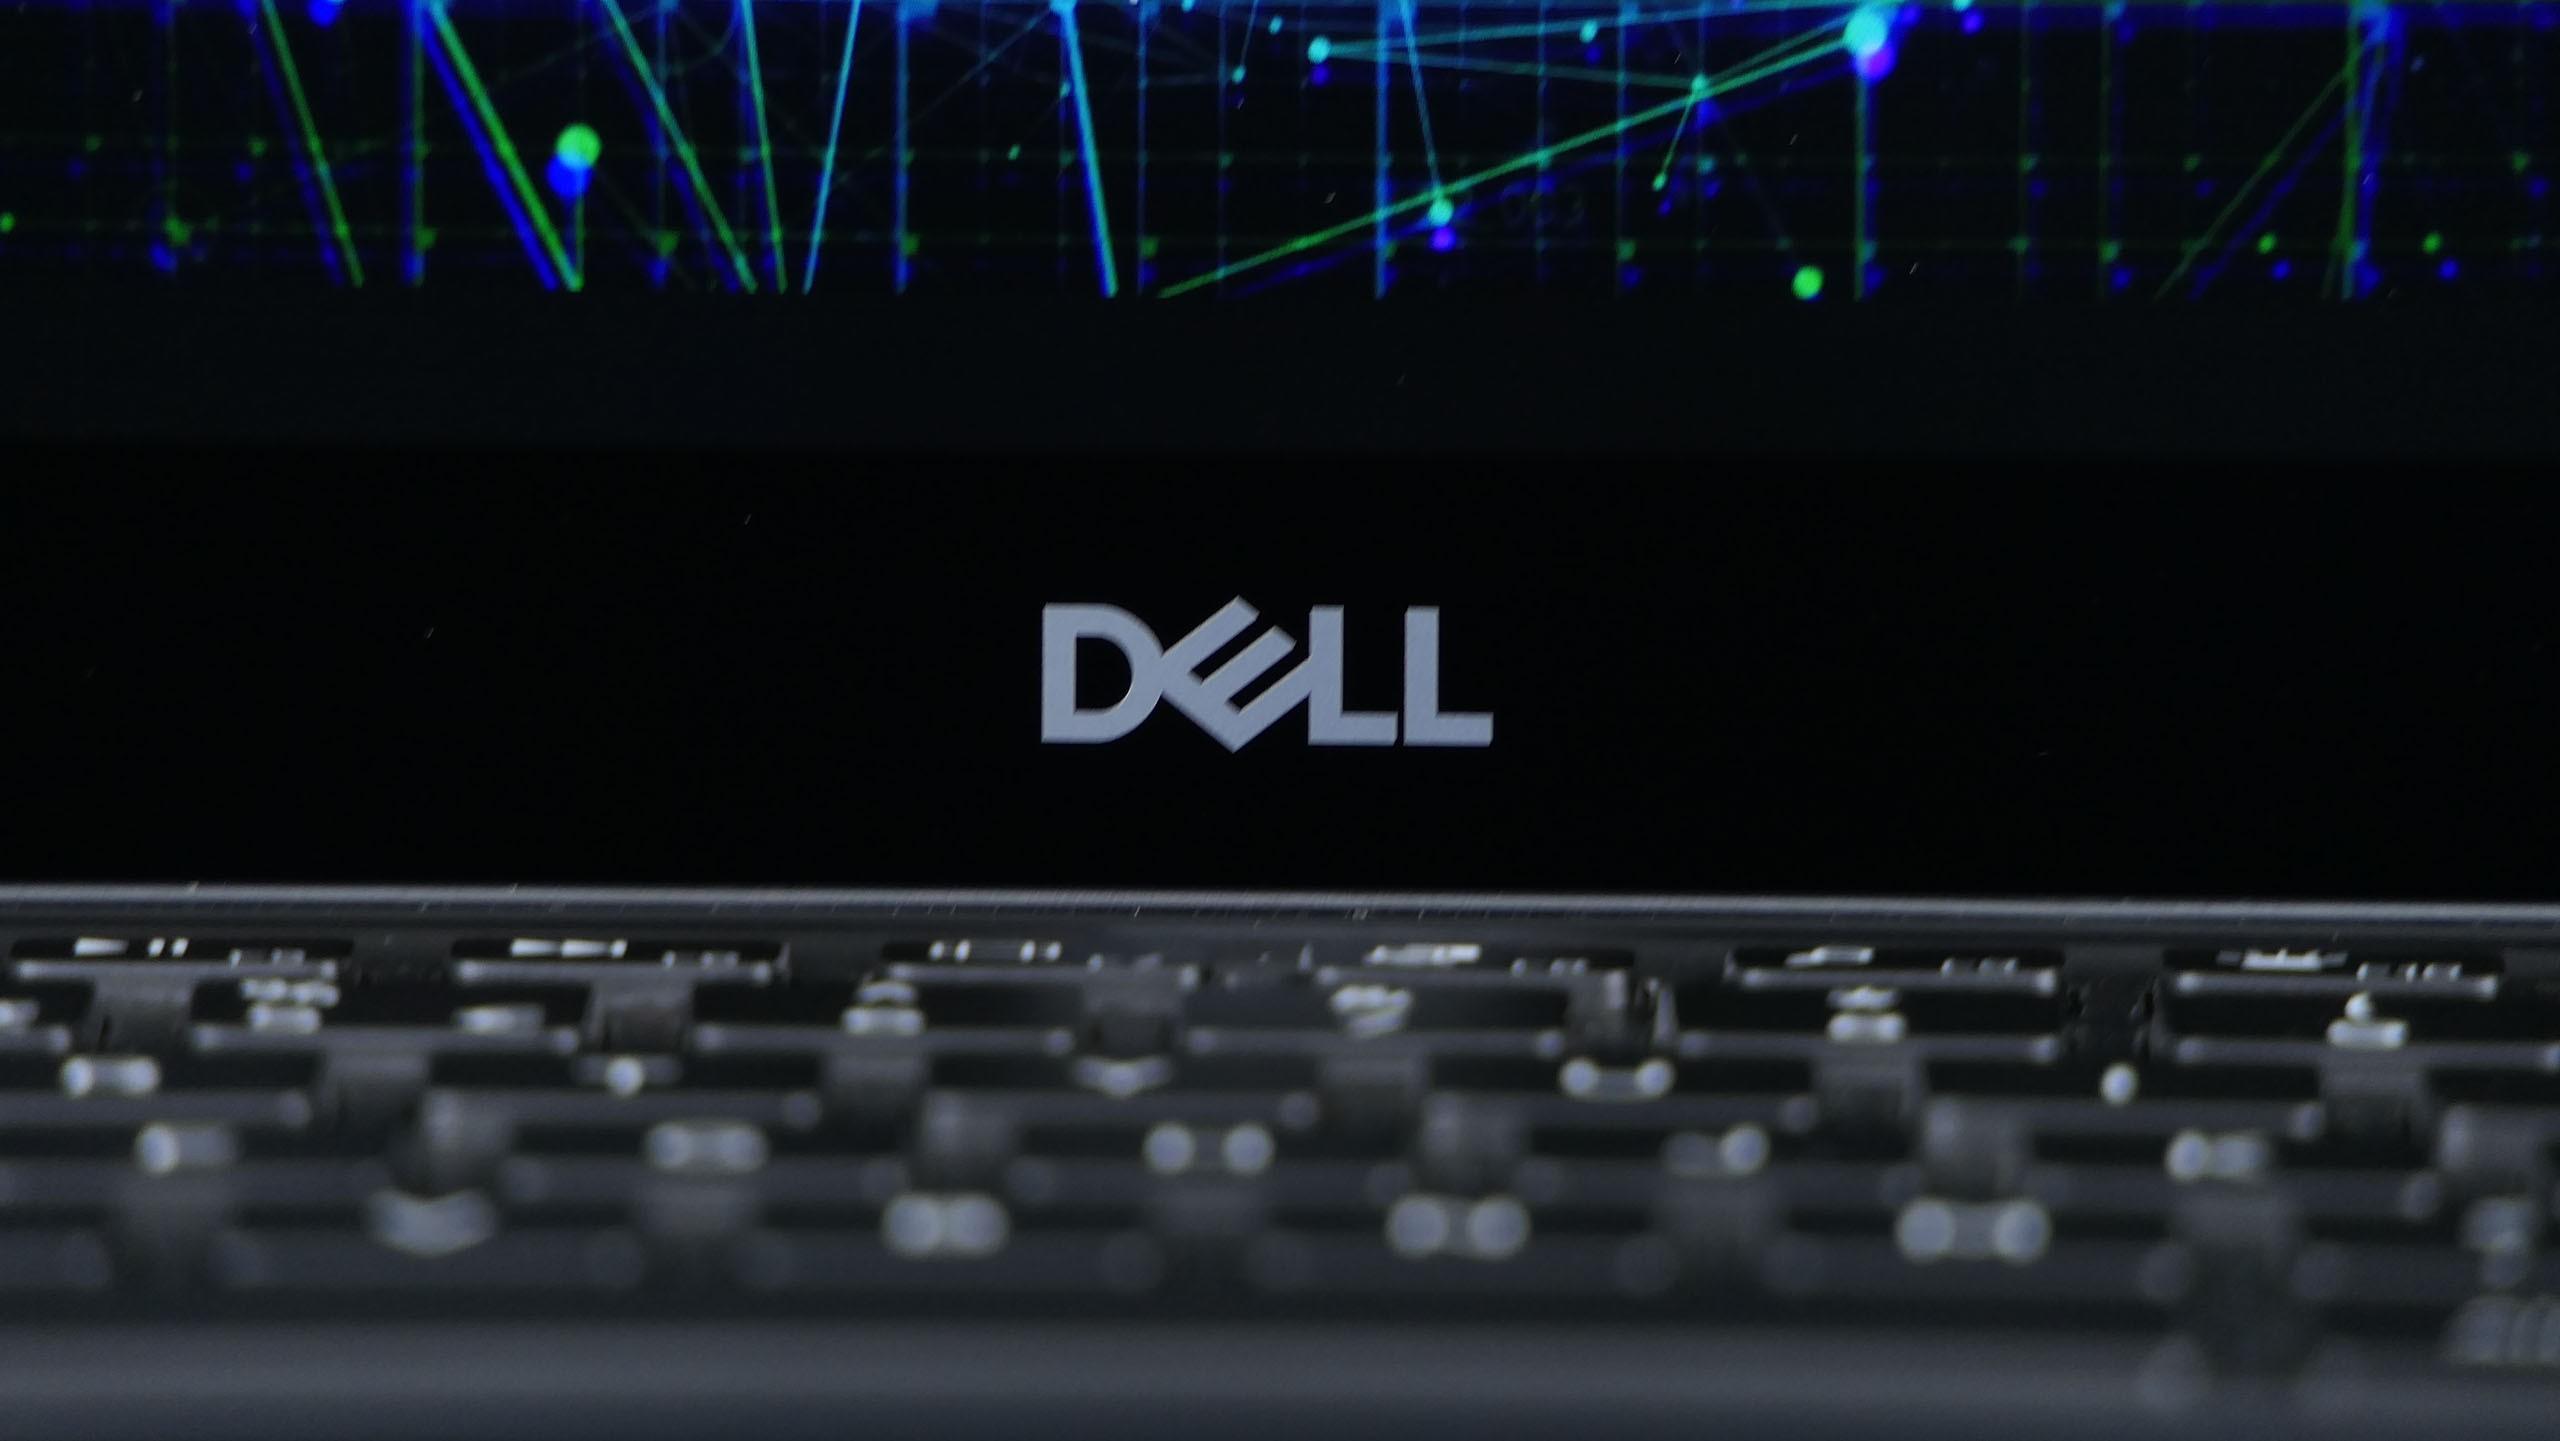 Dell XPS 13 9380 - wyspowa klawiatura